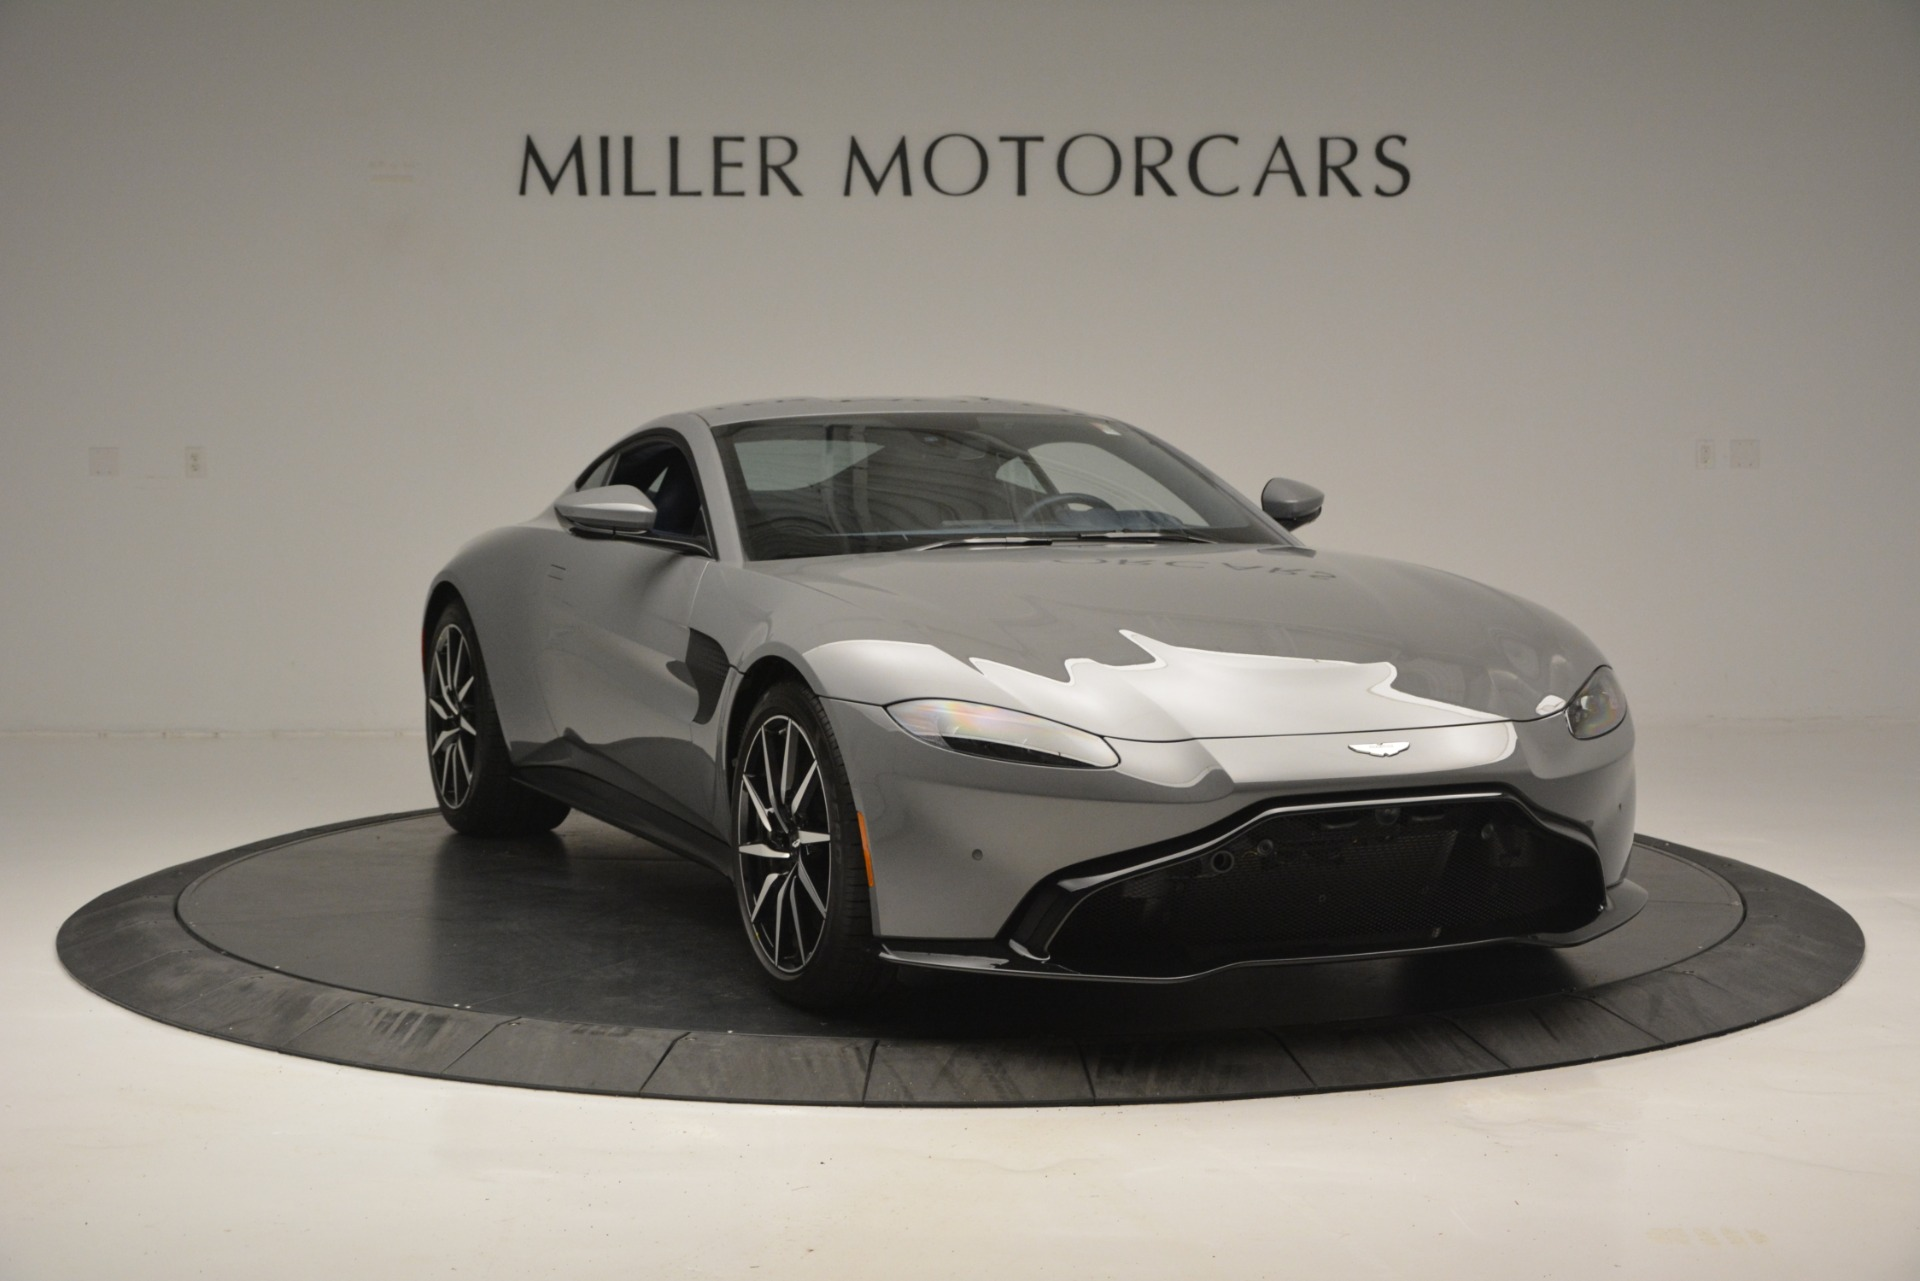 Miller Motorcars New Aston Martin Bugatti Maserati Bentley